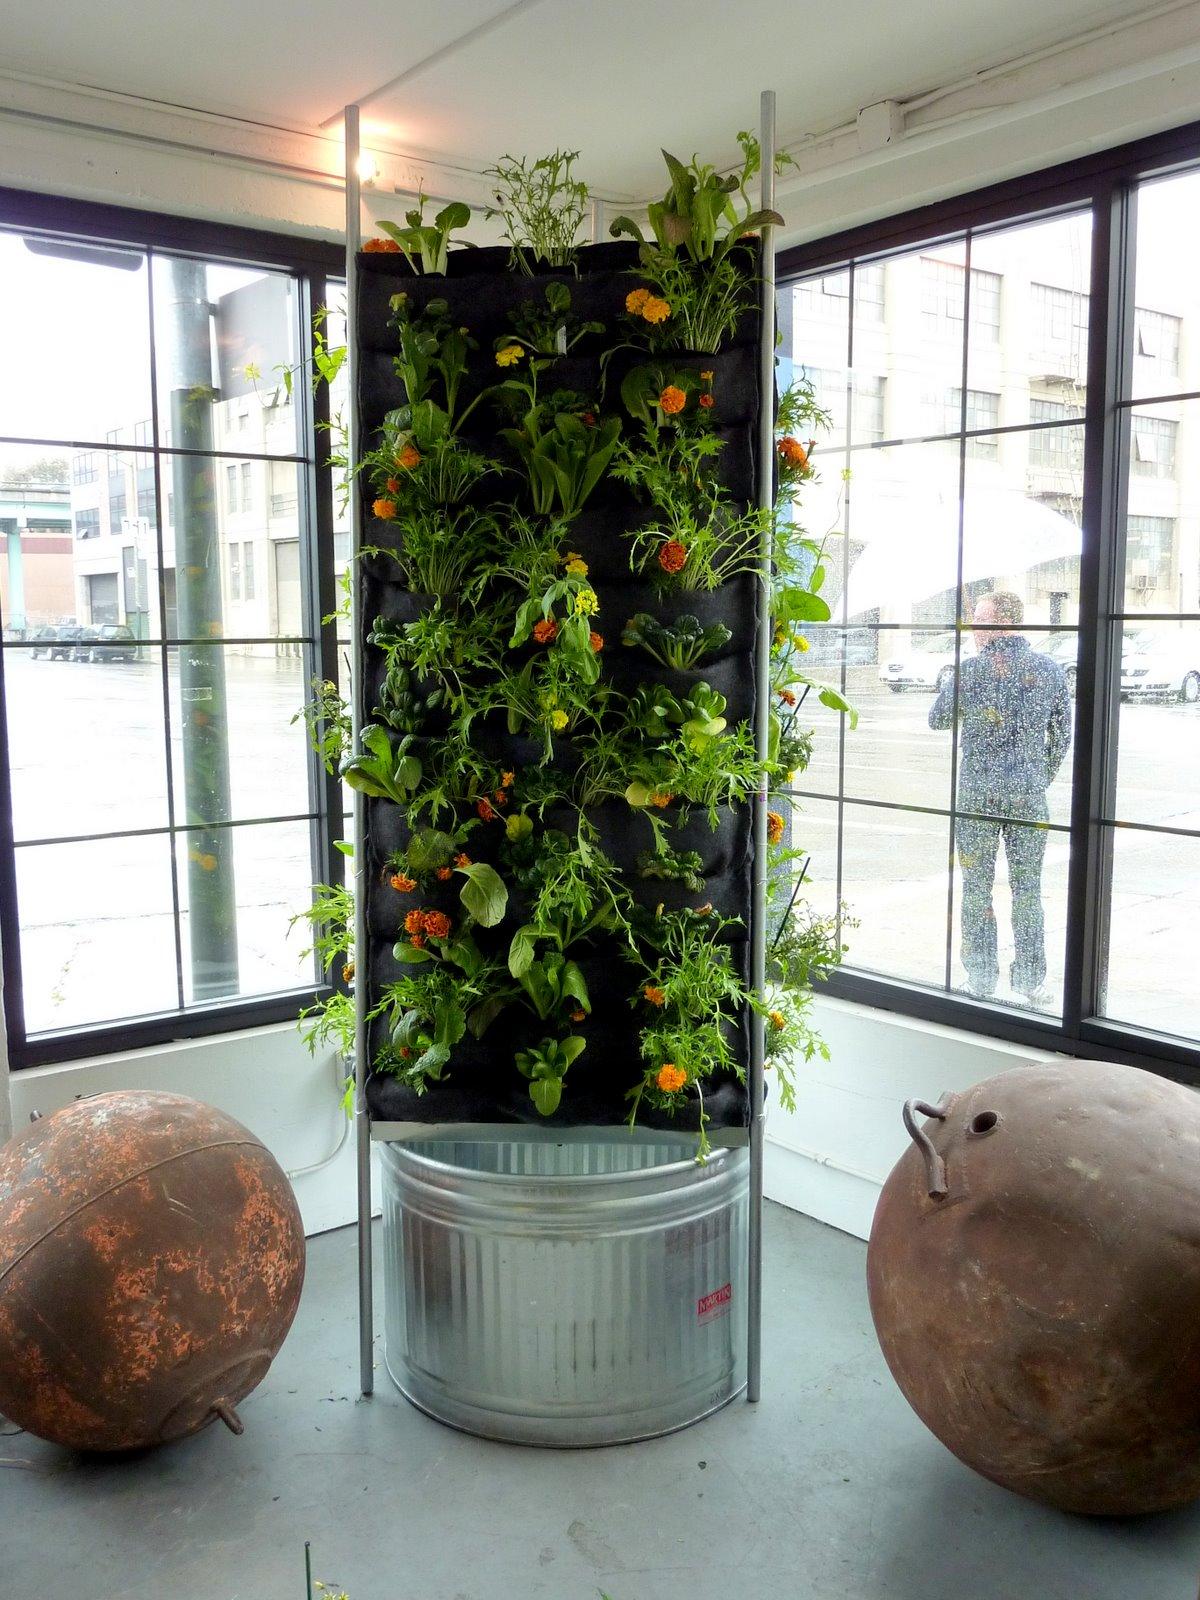 Do It Yourself Home Design: Tower Garden Aquaponics Details